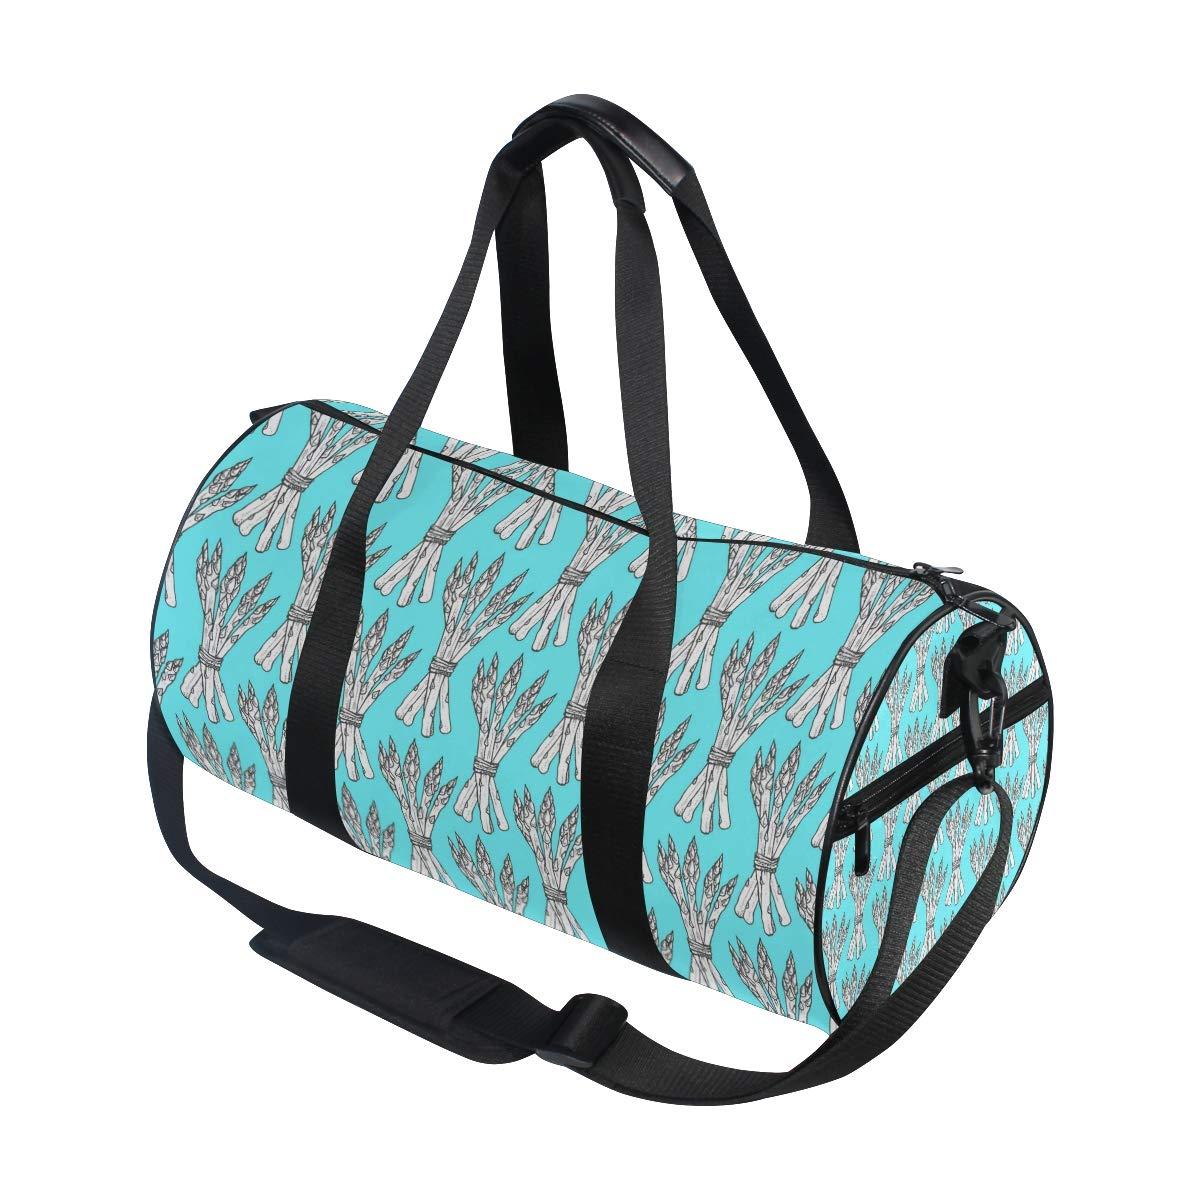 Waterproof Non-Slip Wearable Crossbody Bag fitness bag Shoulder Bag Fall Vegetable Seeds Picture